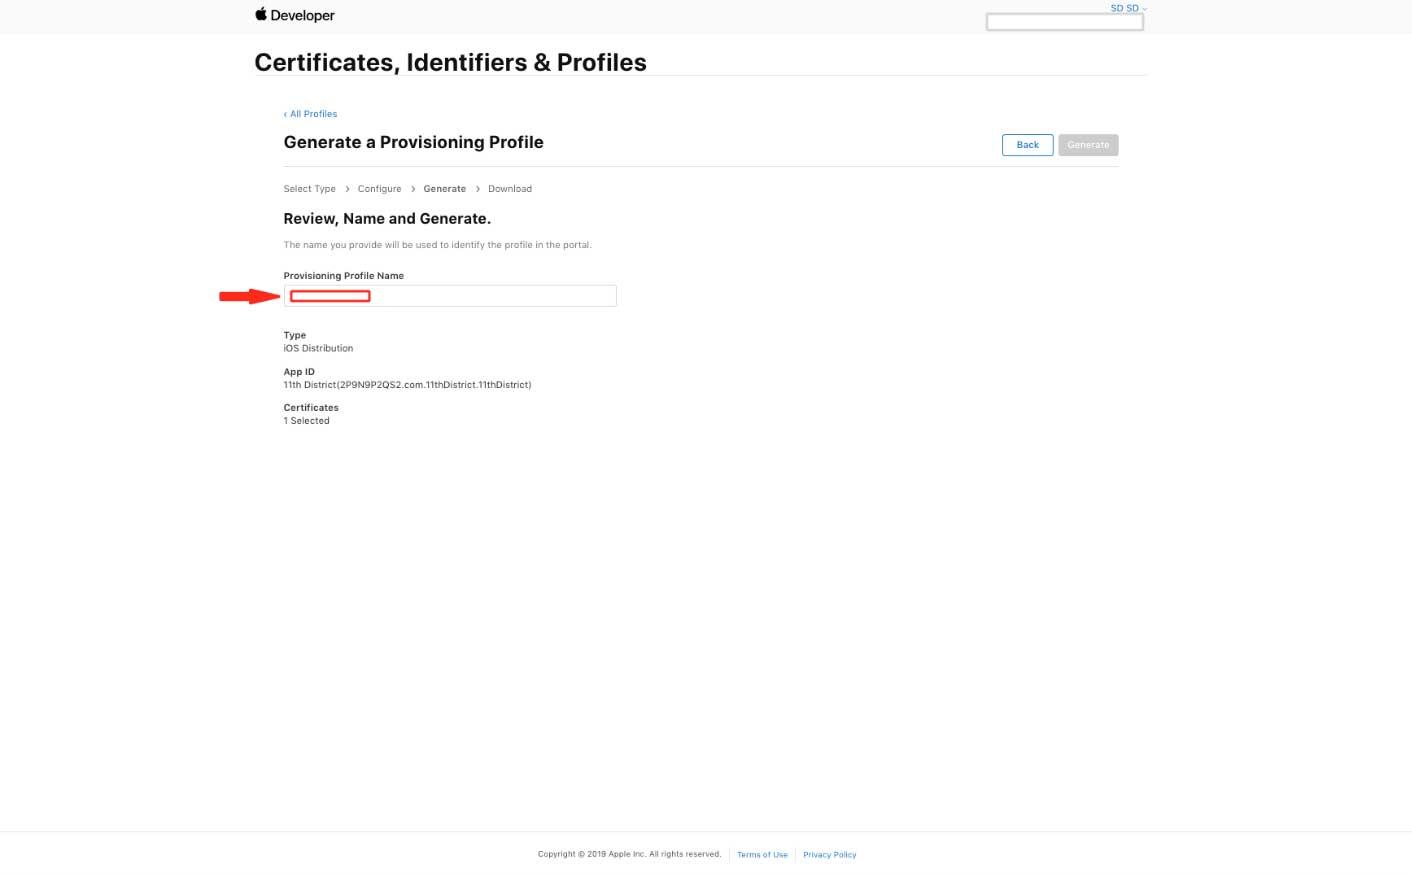 provisioning Profile Name